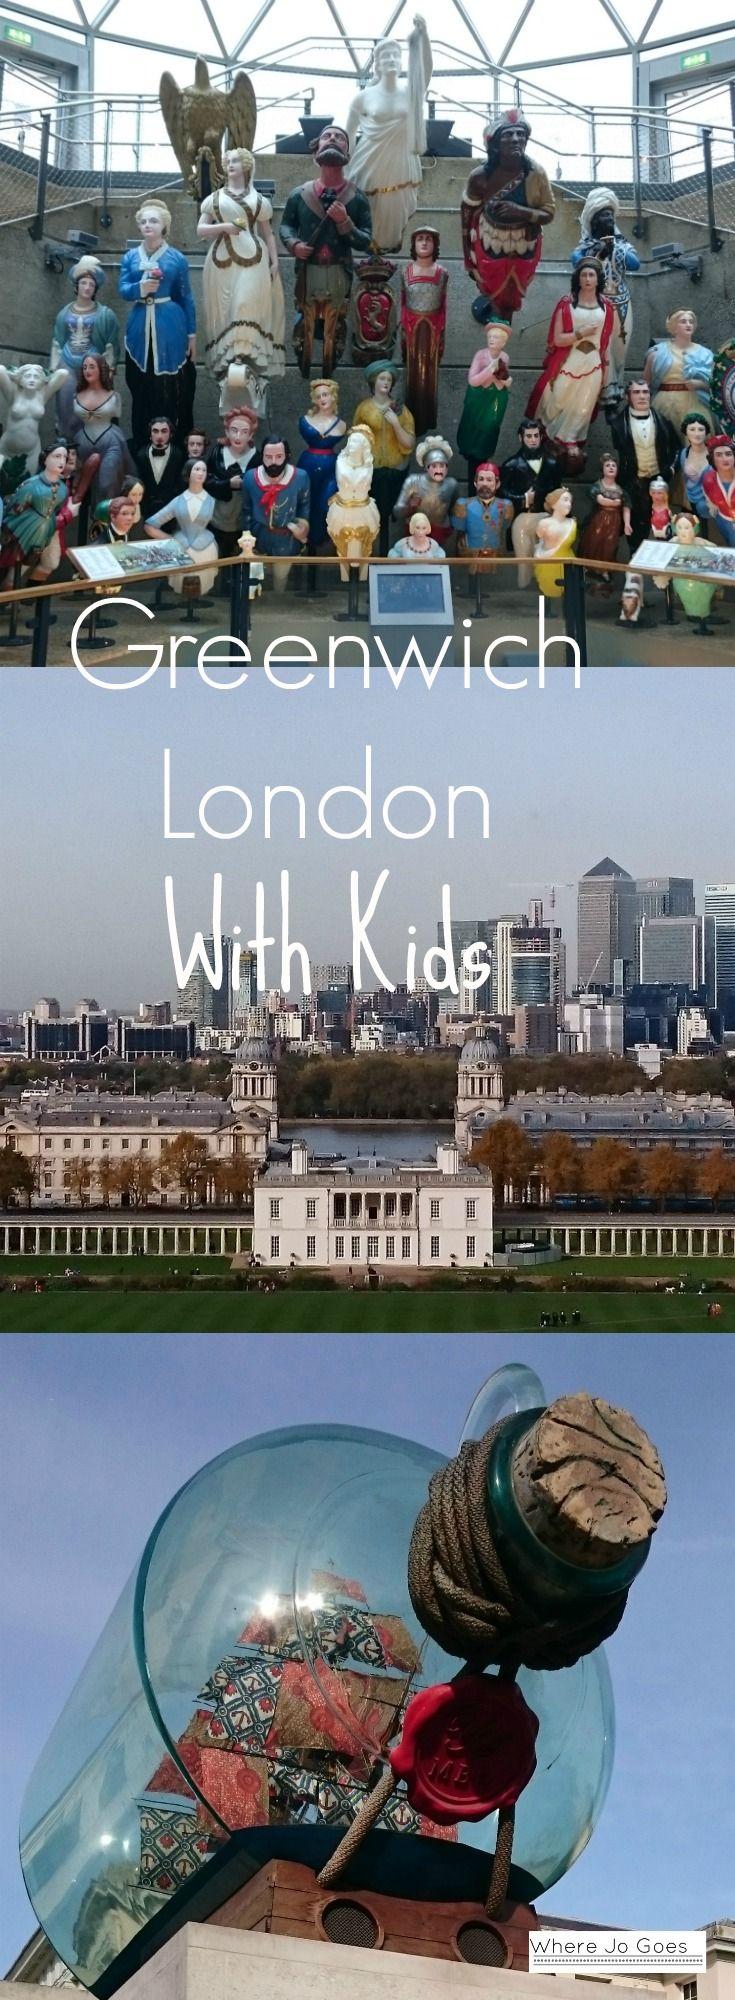 GREENWICH, LONDON,WITH KIDS